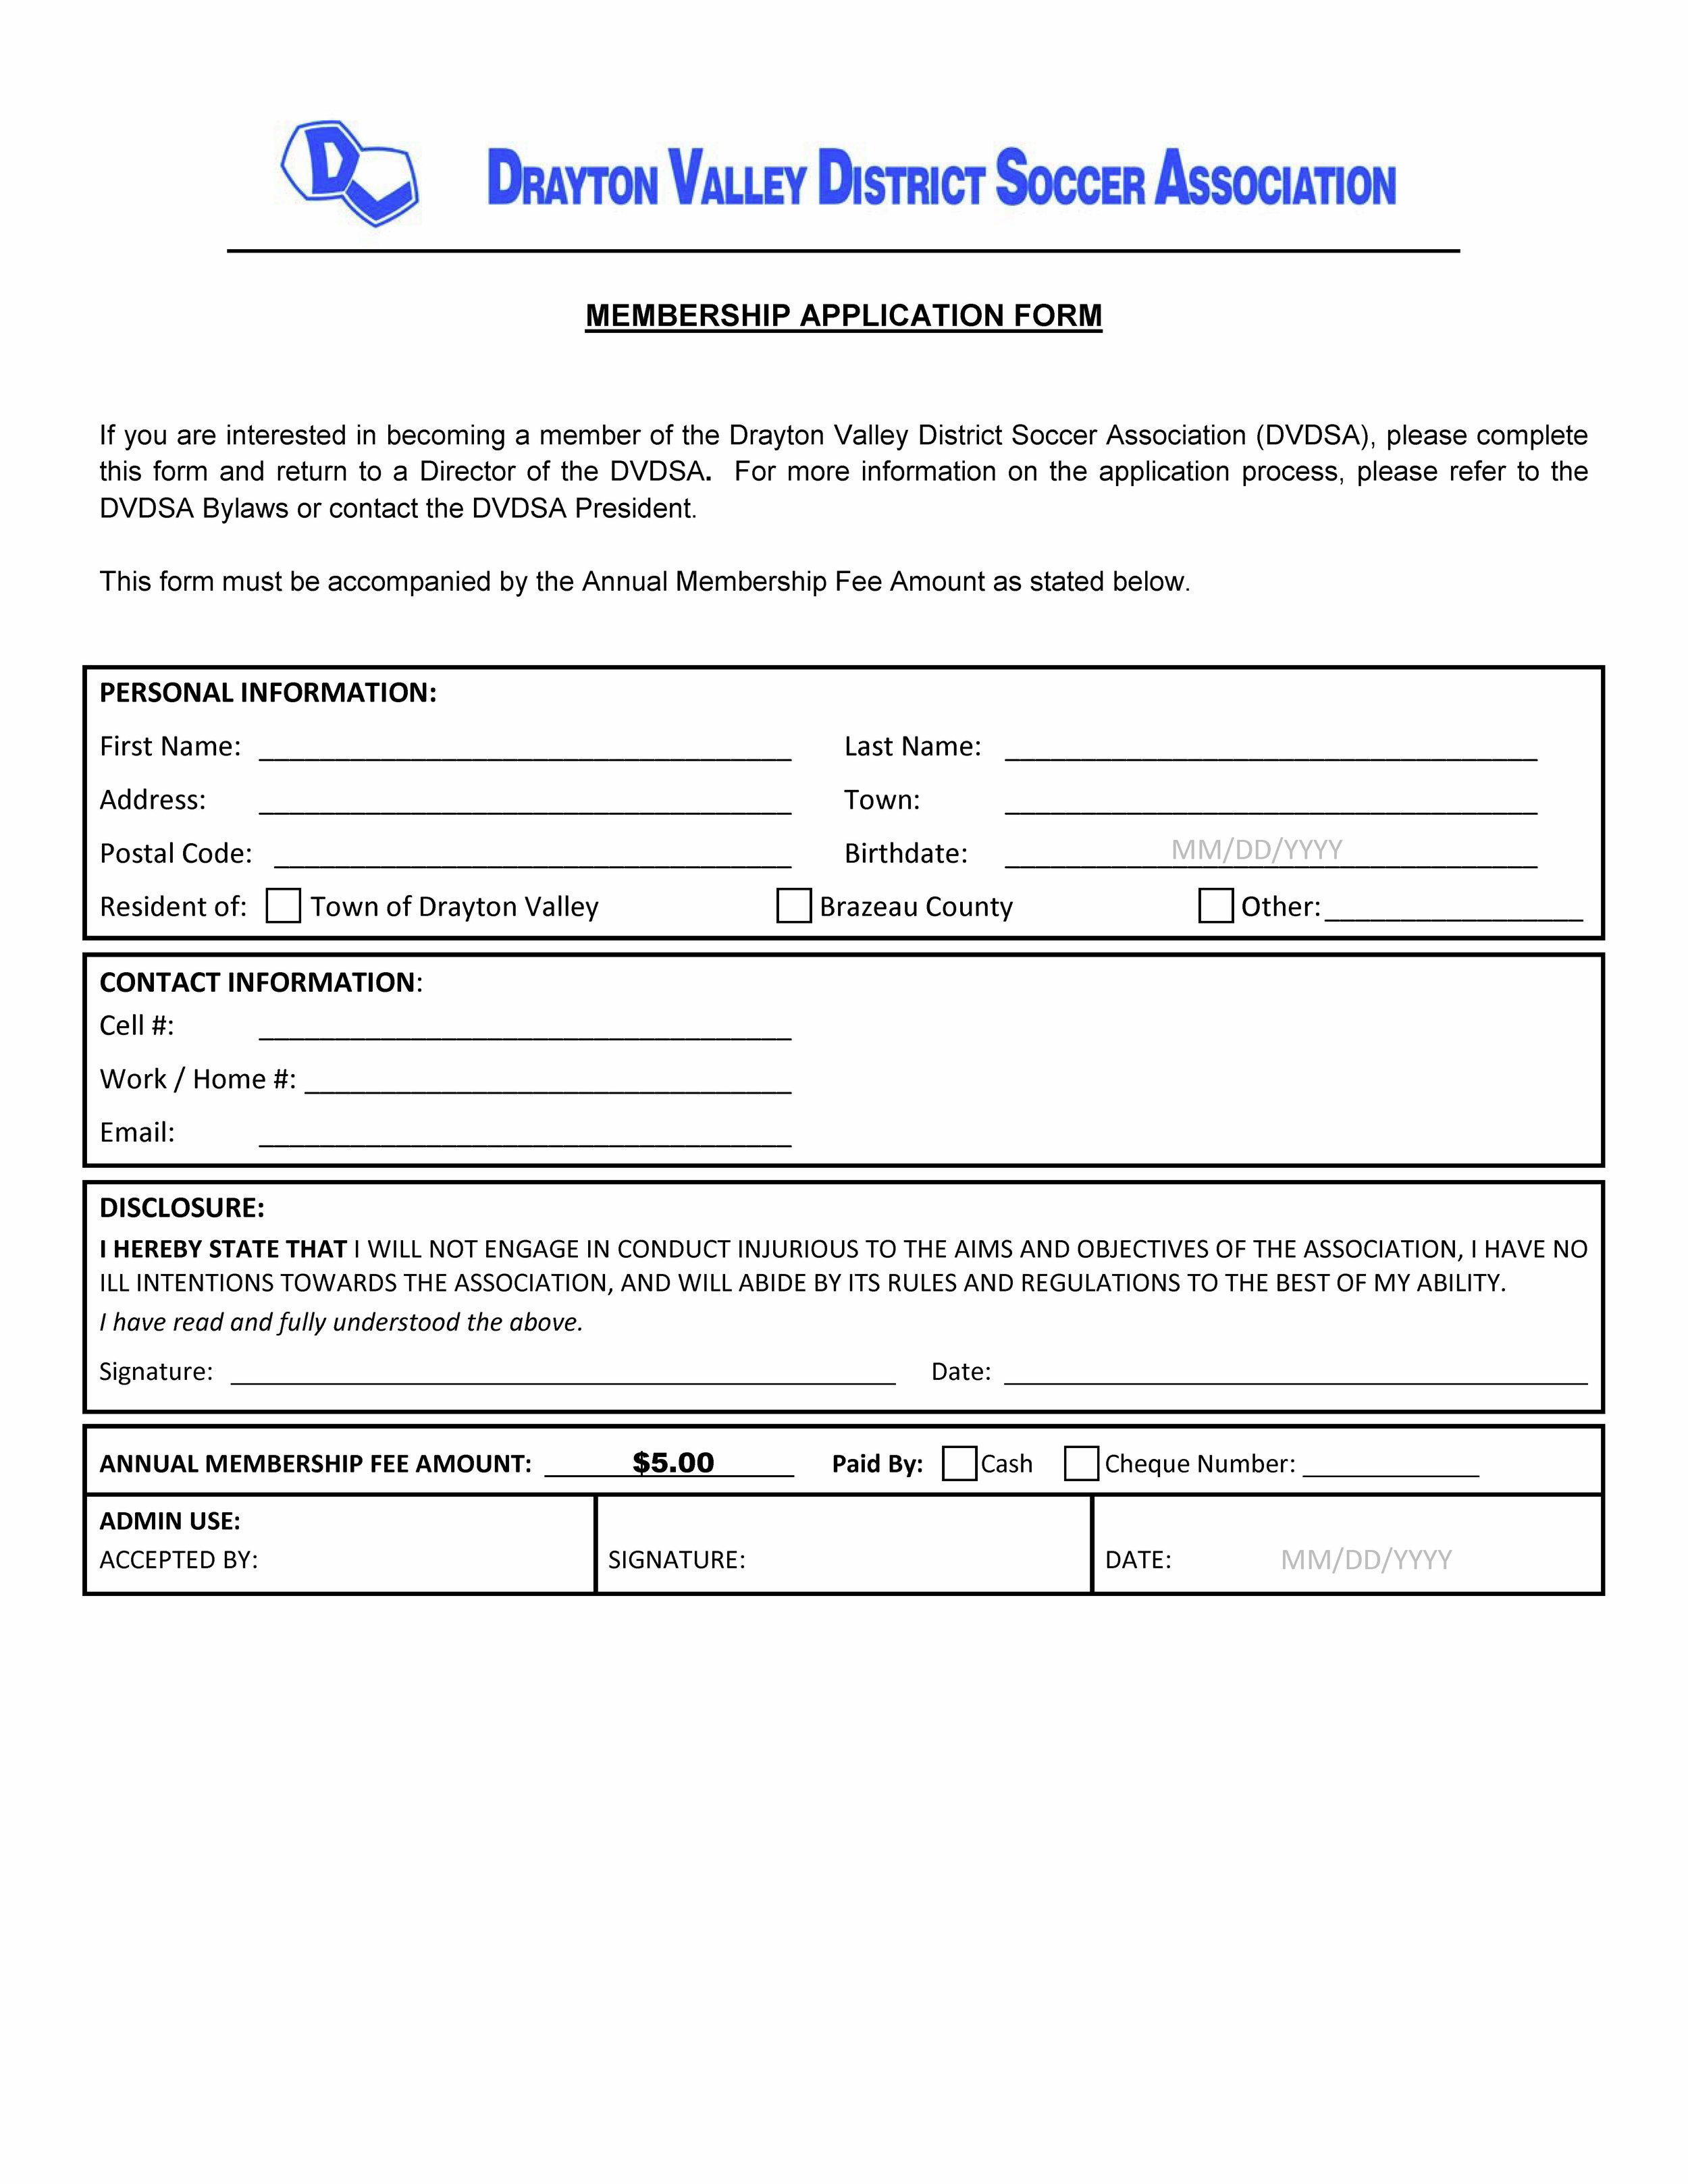 DVDSA Membership Application.jpg